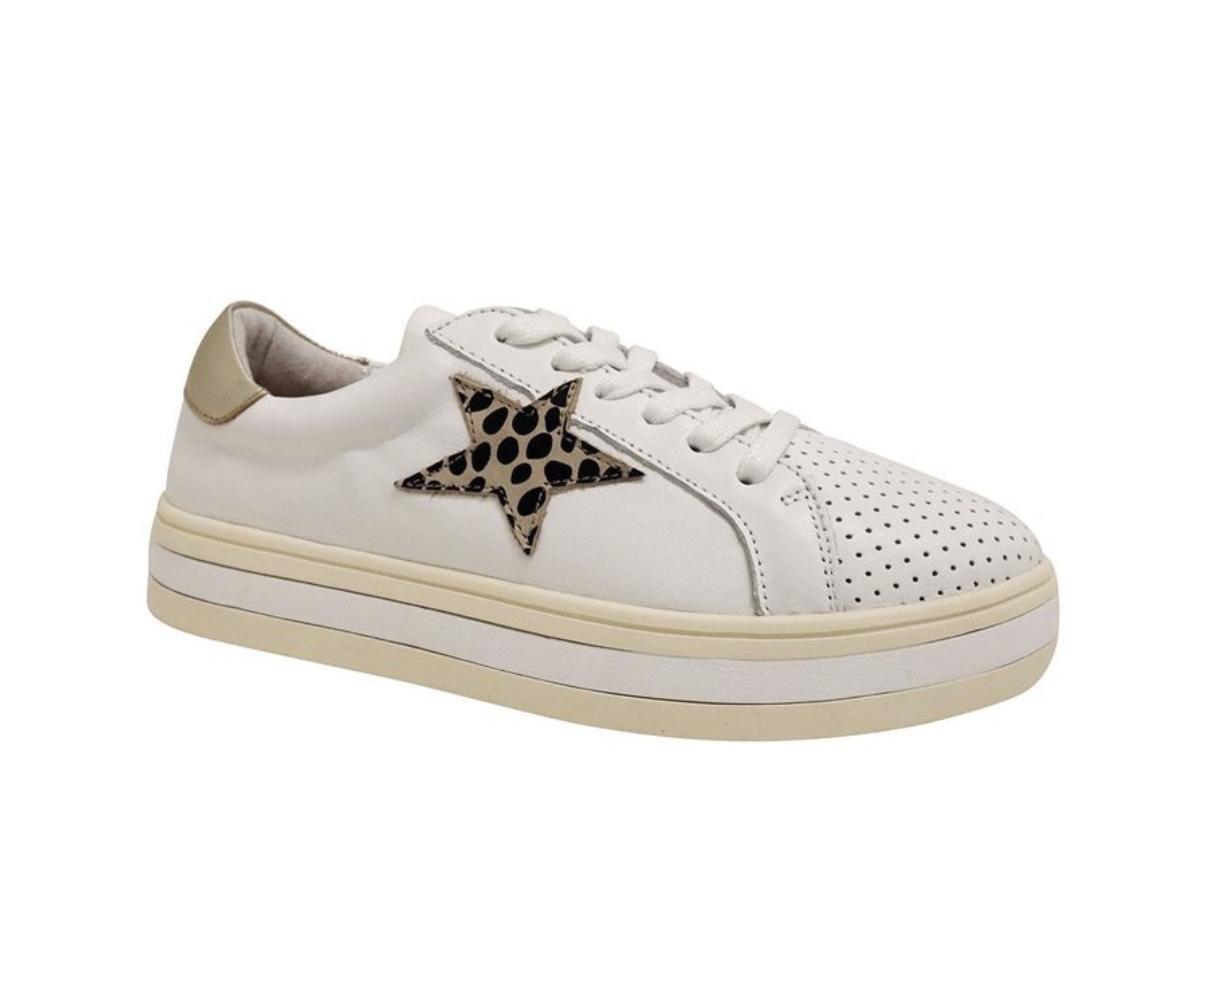 Alfie And Evie Pixie Sneaker White/Animal